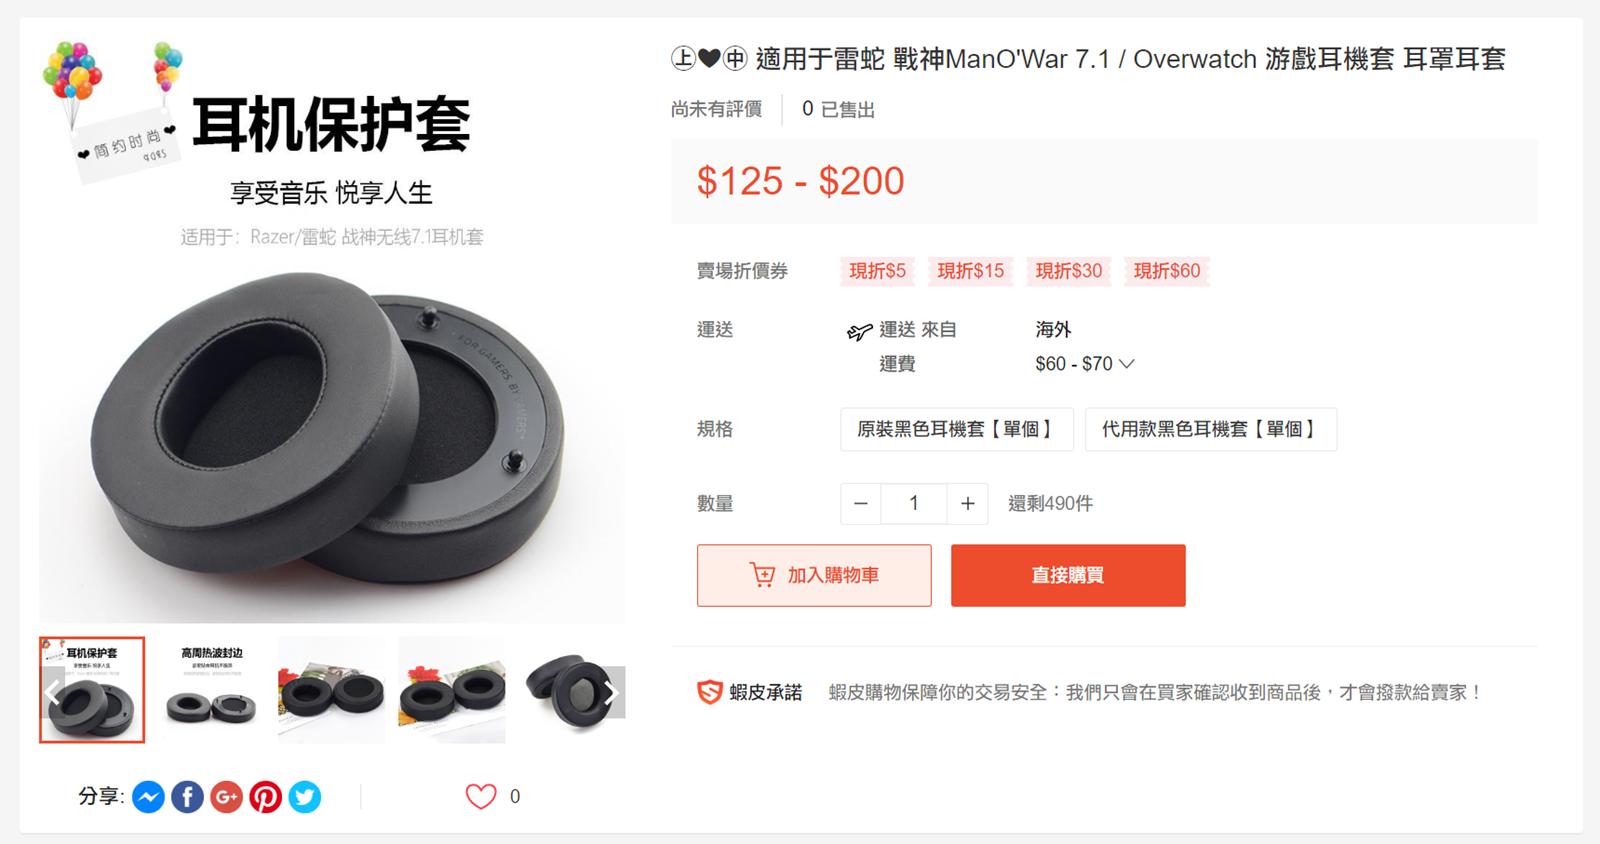 Razer 雷蛇 戰神 ManO'War 耳機耳罩更換 @3C 達人廖阿輝